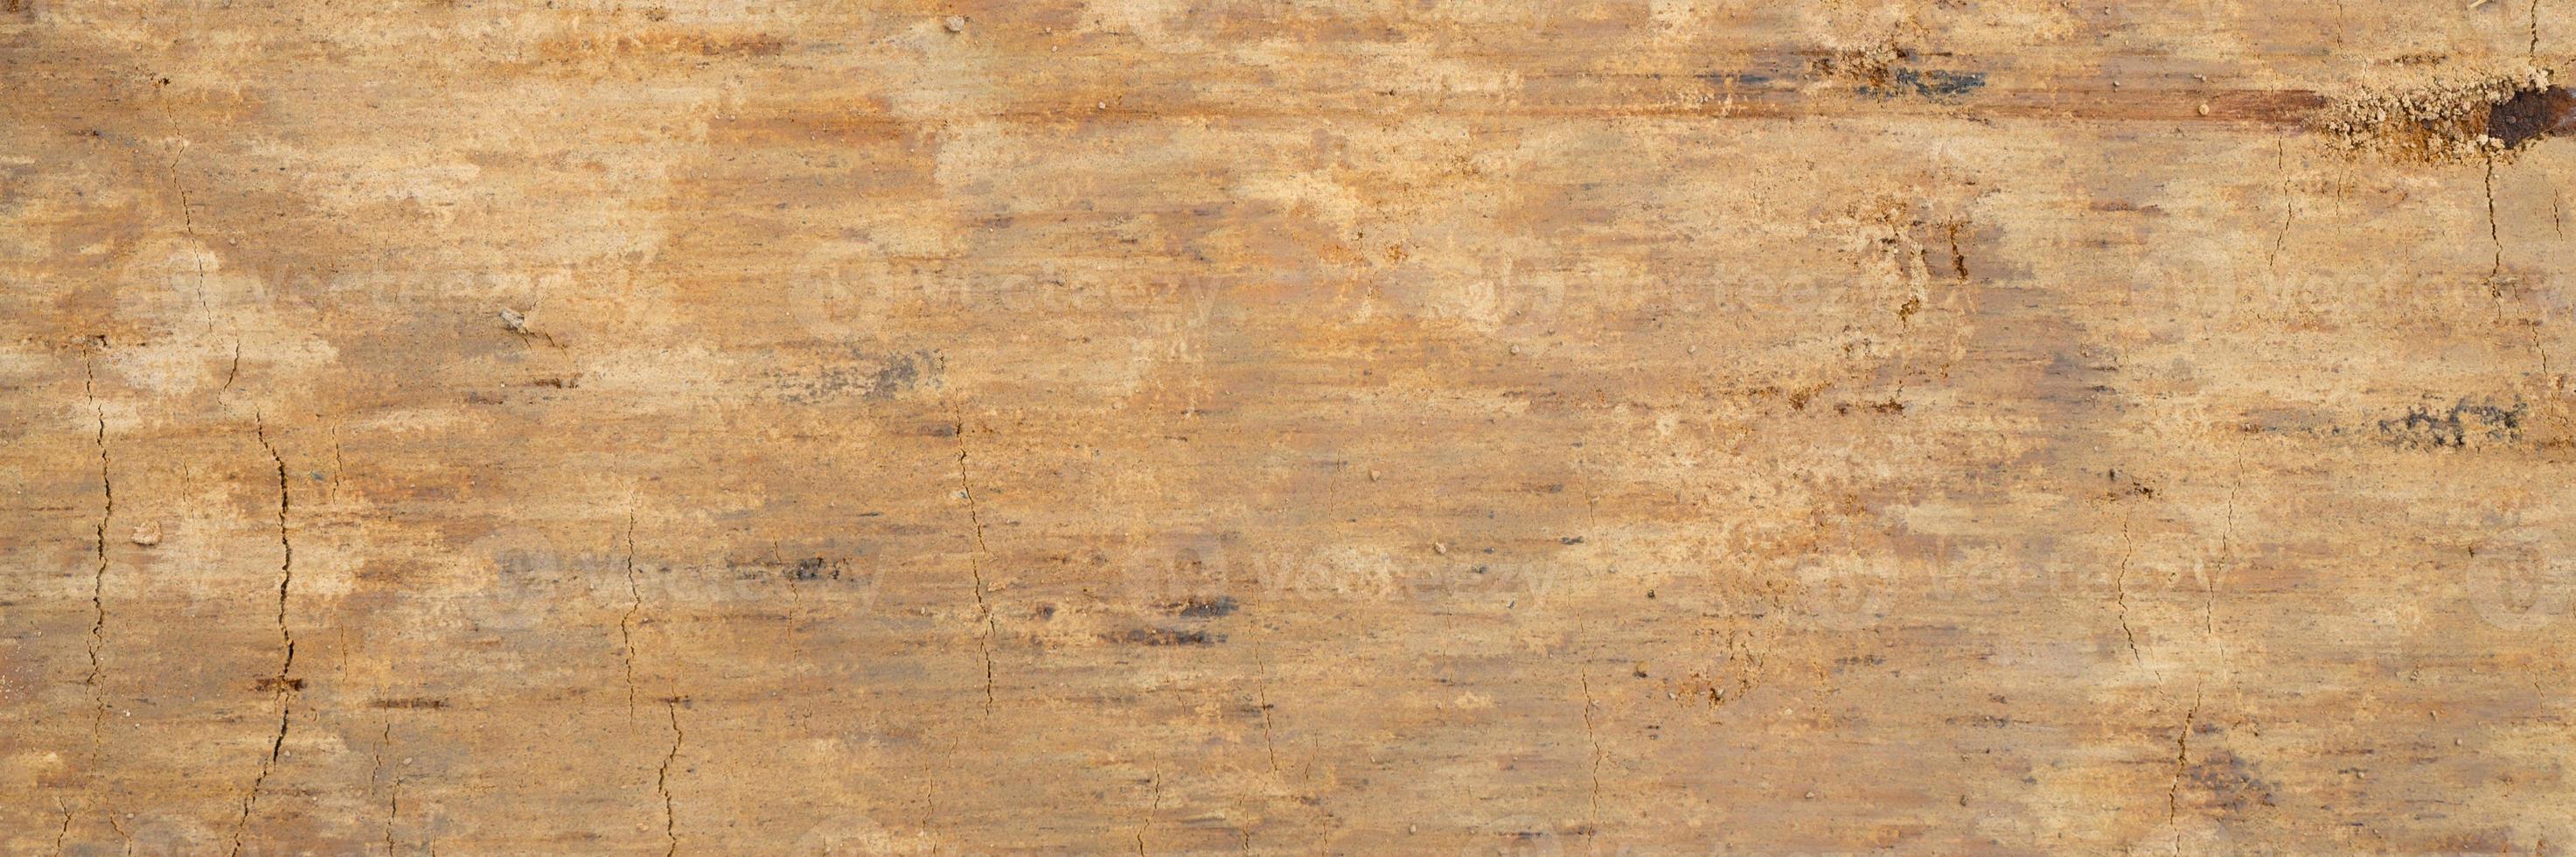 Textura de fondo de la superficie lisa de la arena de madera foto